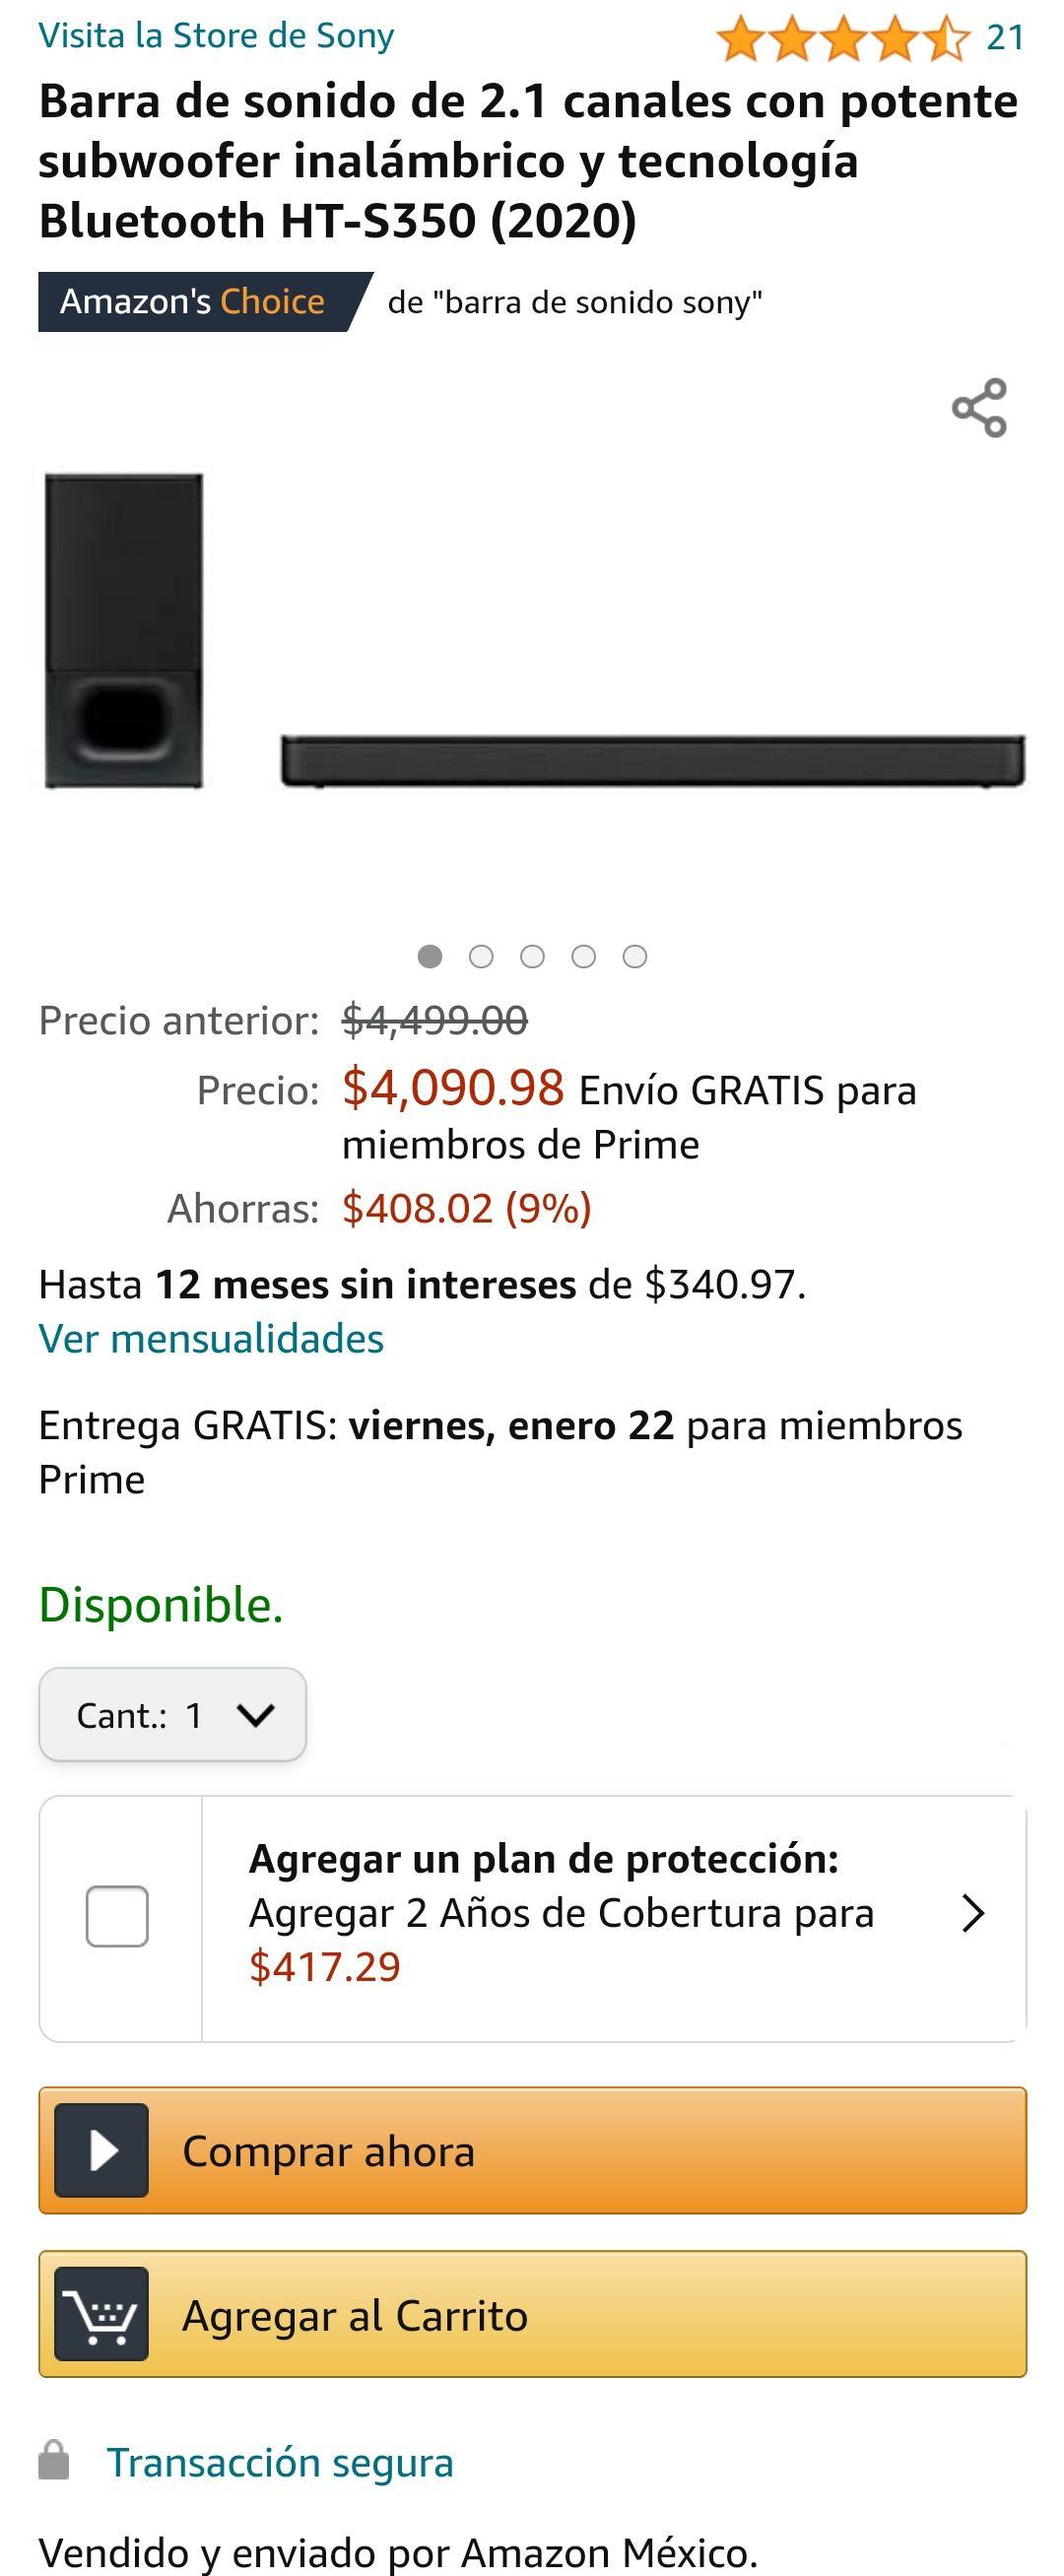 Amazon: Sony HT-S350 2.1 Subwoofer Inalámbrico 320 watts